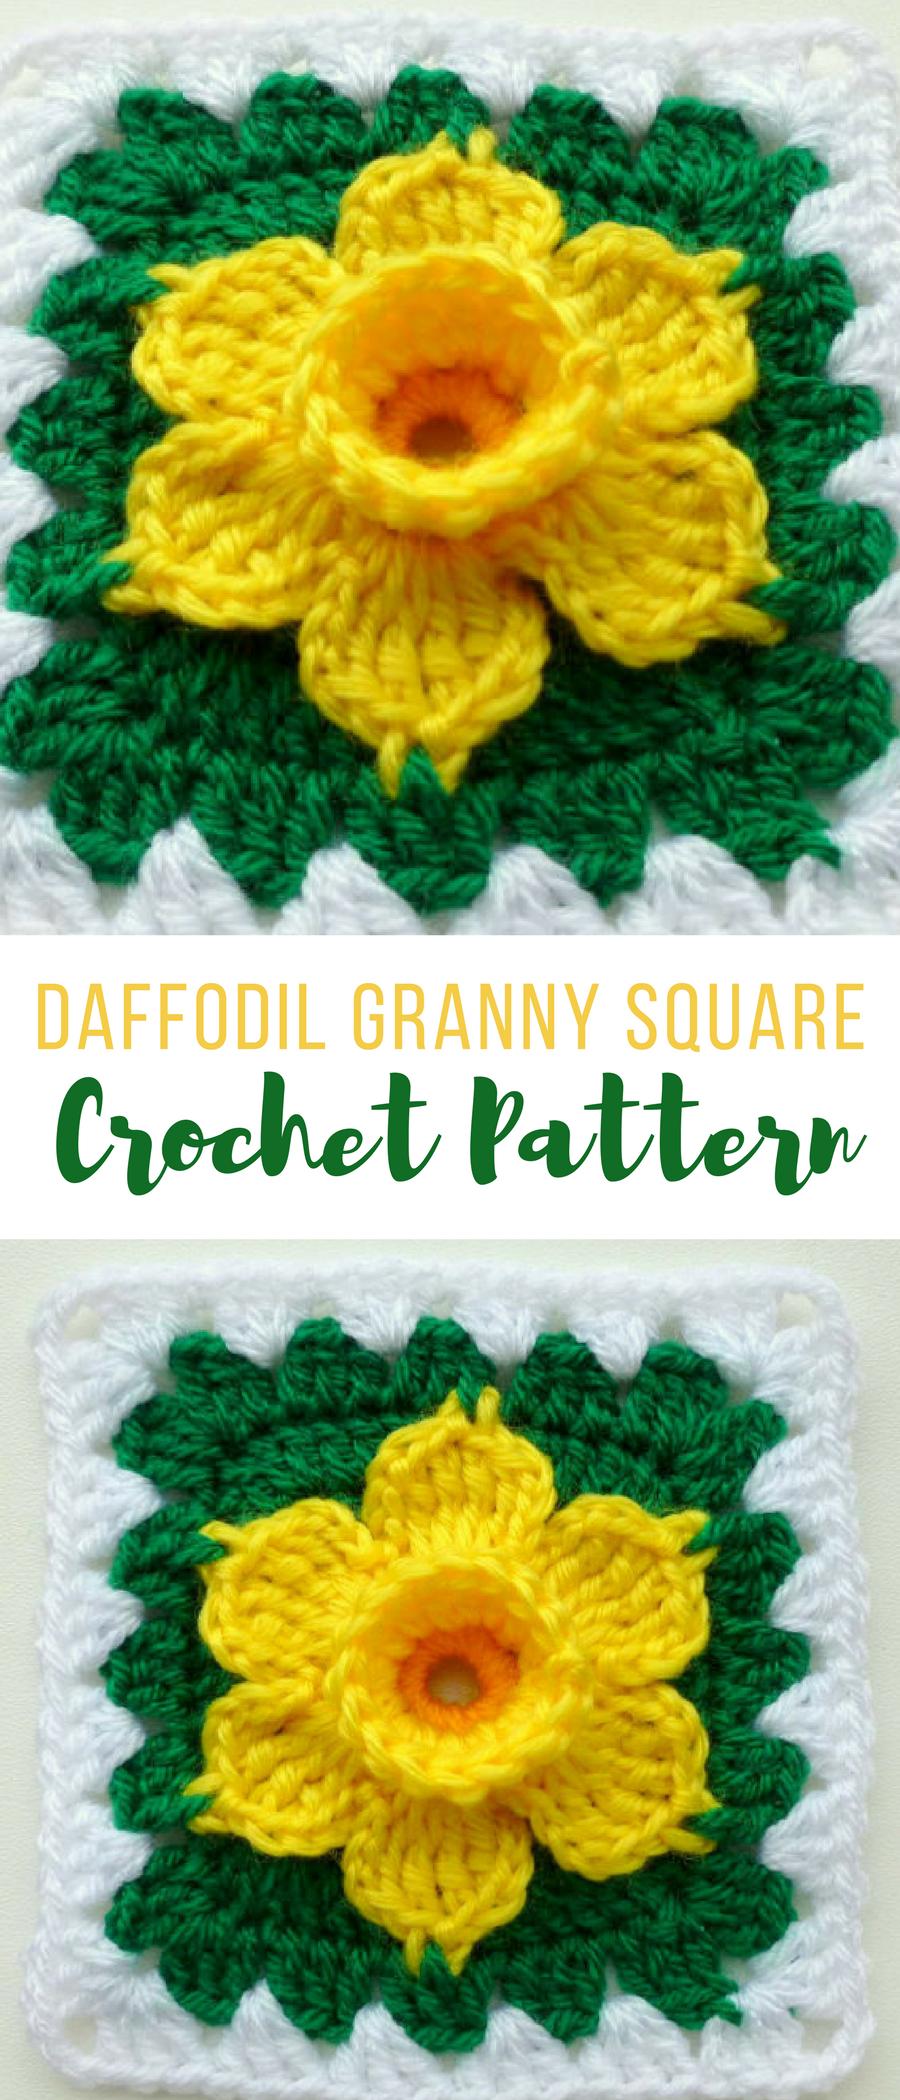 Crochet Daffodil Granny Square Pattern Crochetflowerpatterns